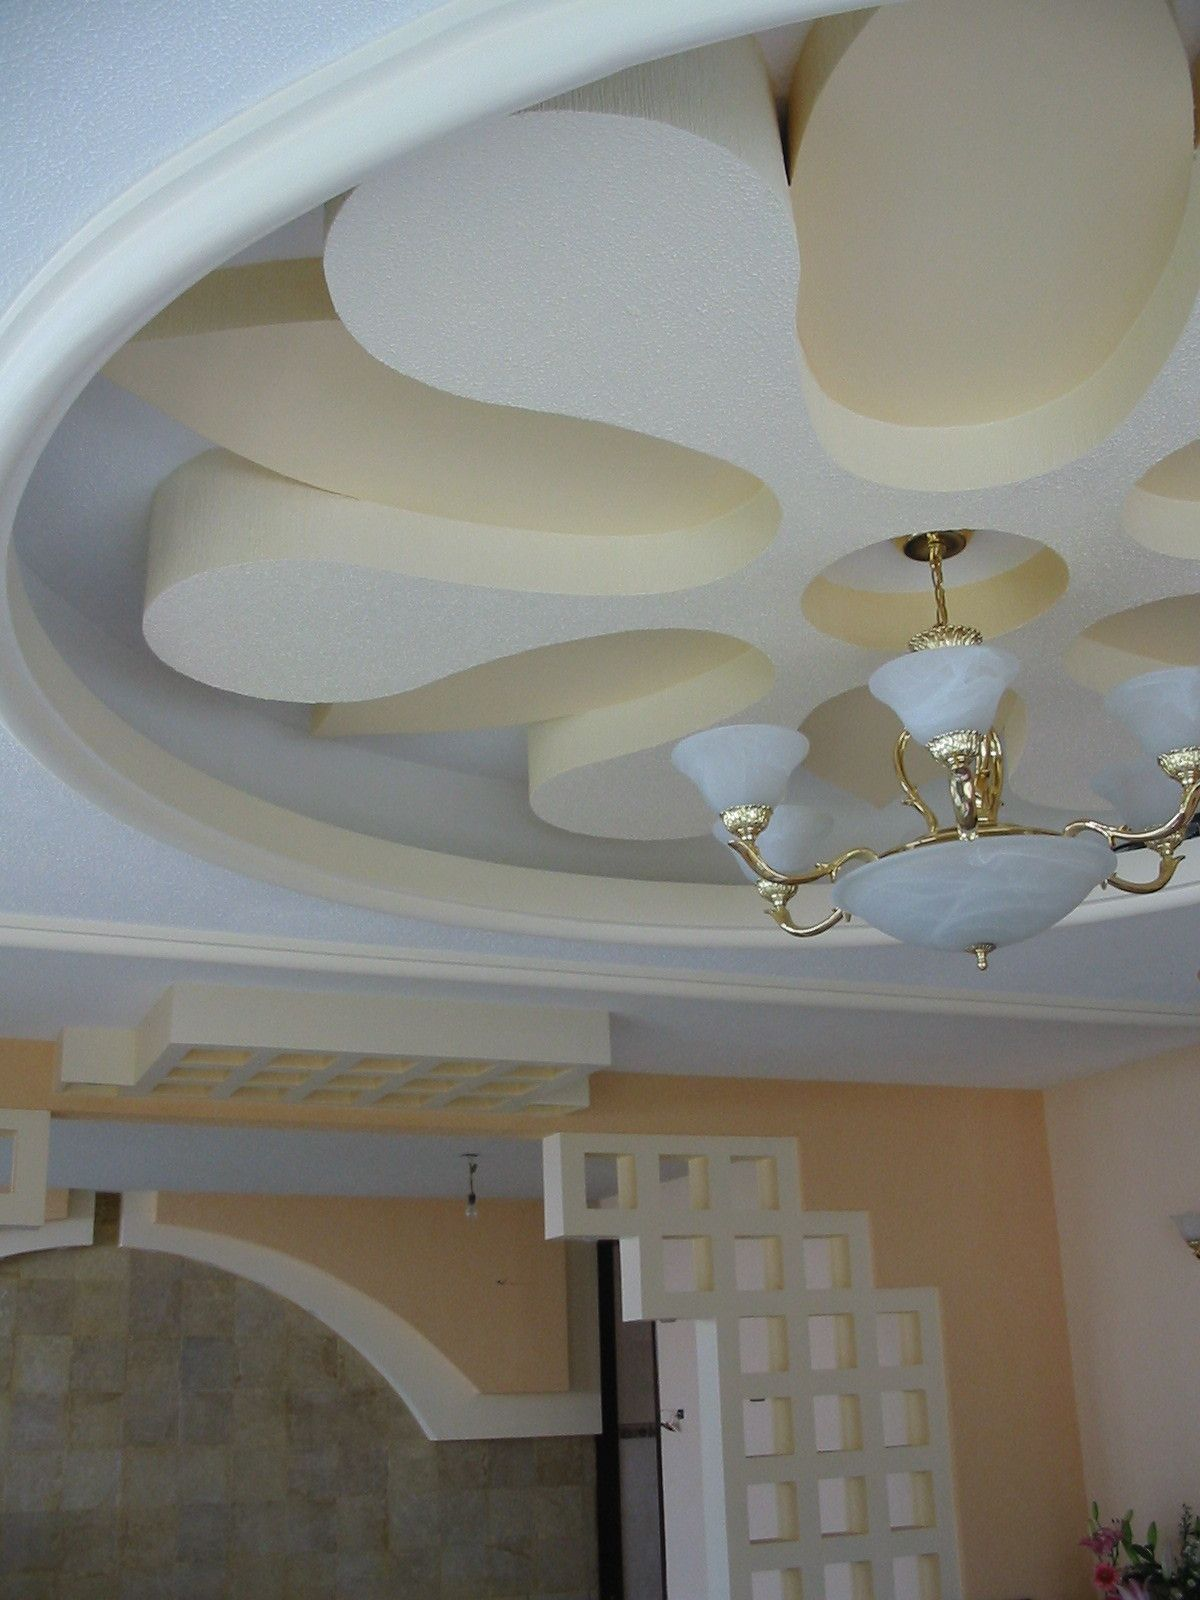 Dise o en tablaroca hogar pinterest platre fait sur for Metro cuadrado decoracion